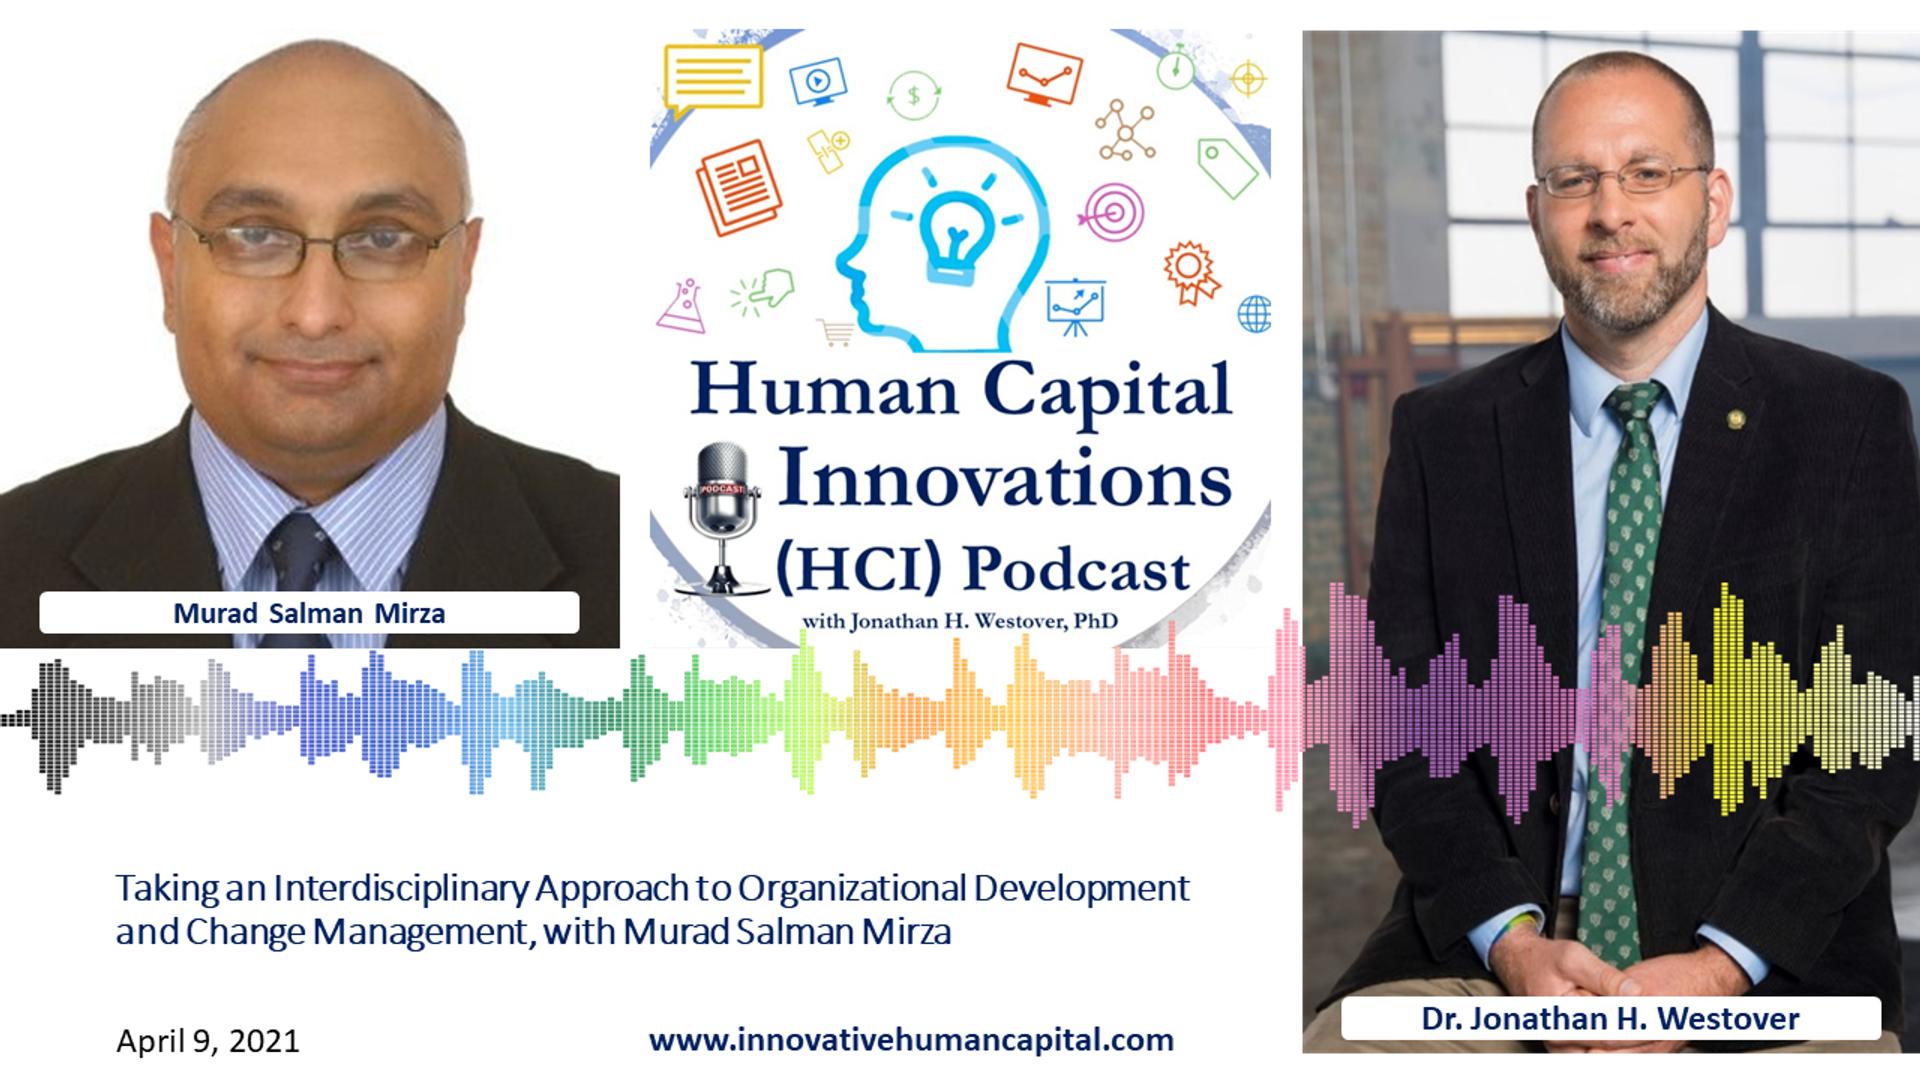 Interdisciplinary Organizational Development & Change